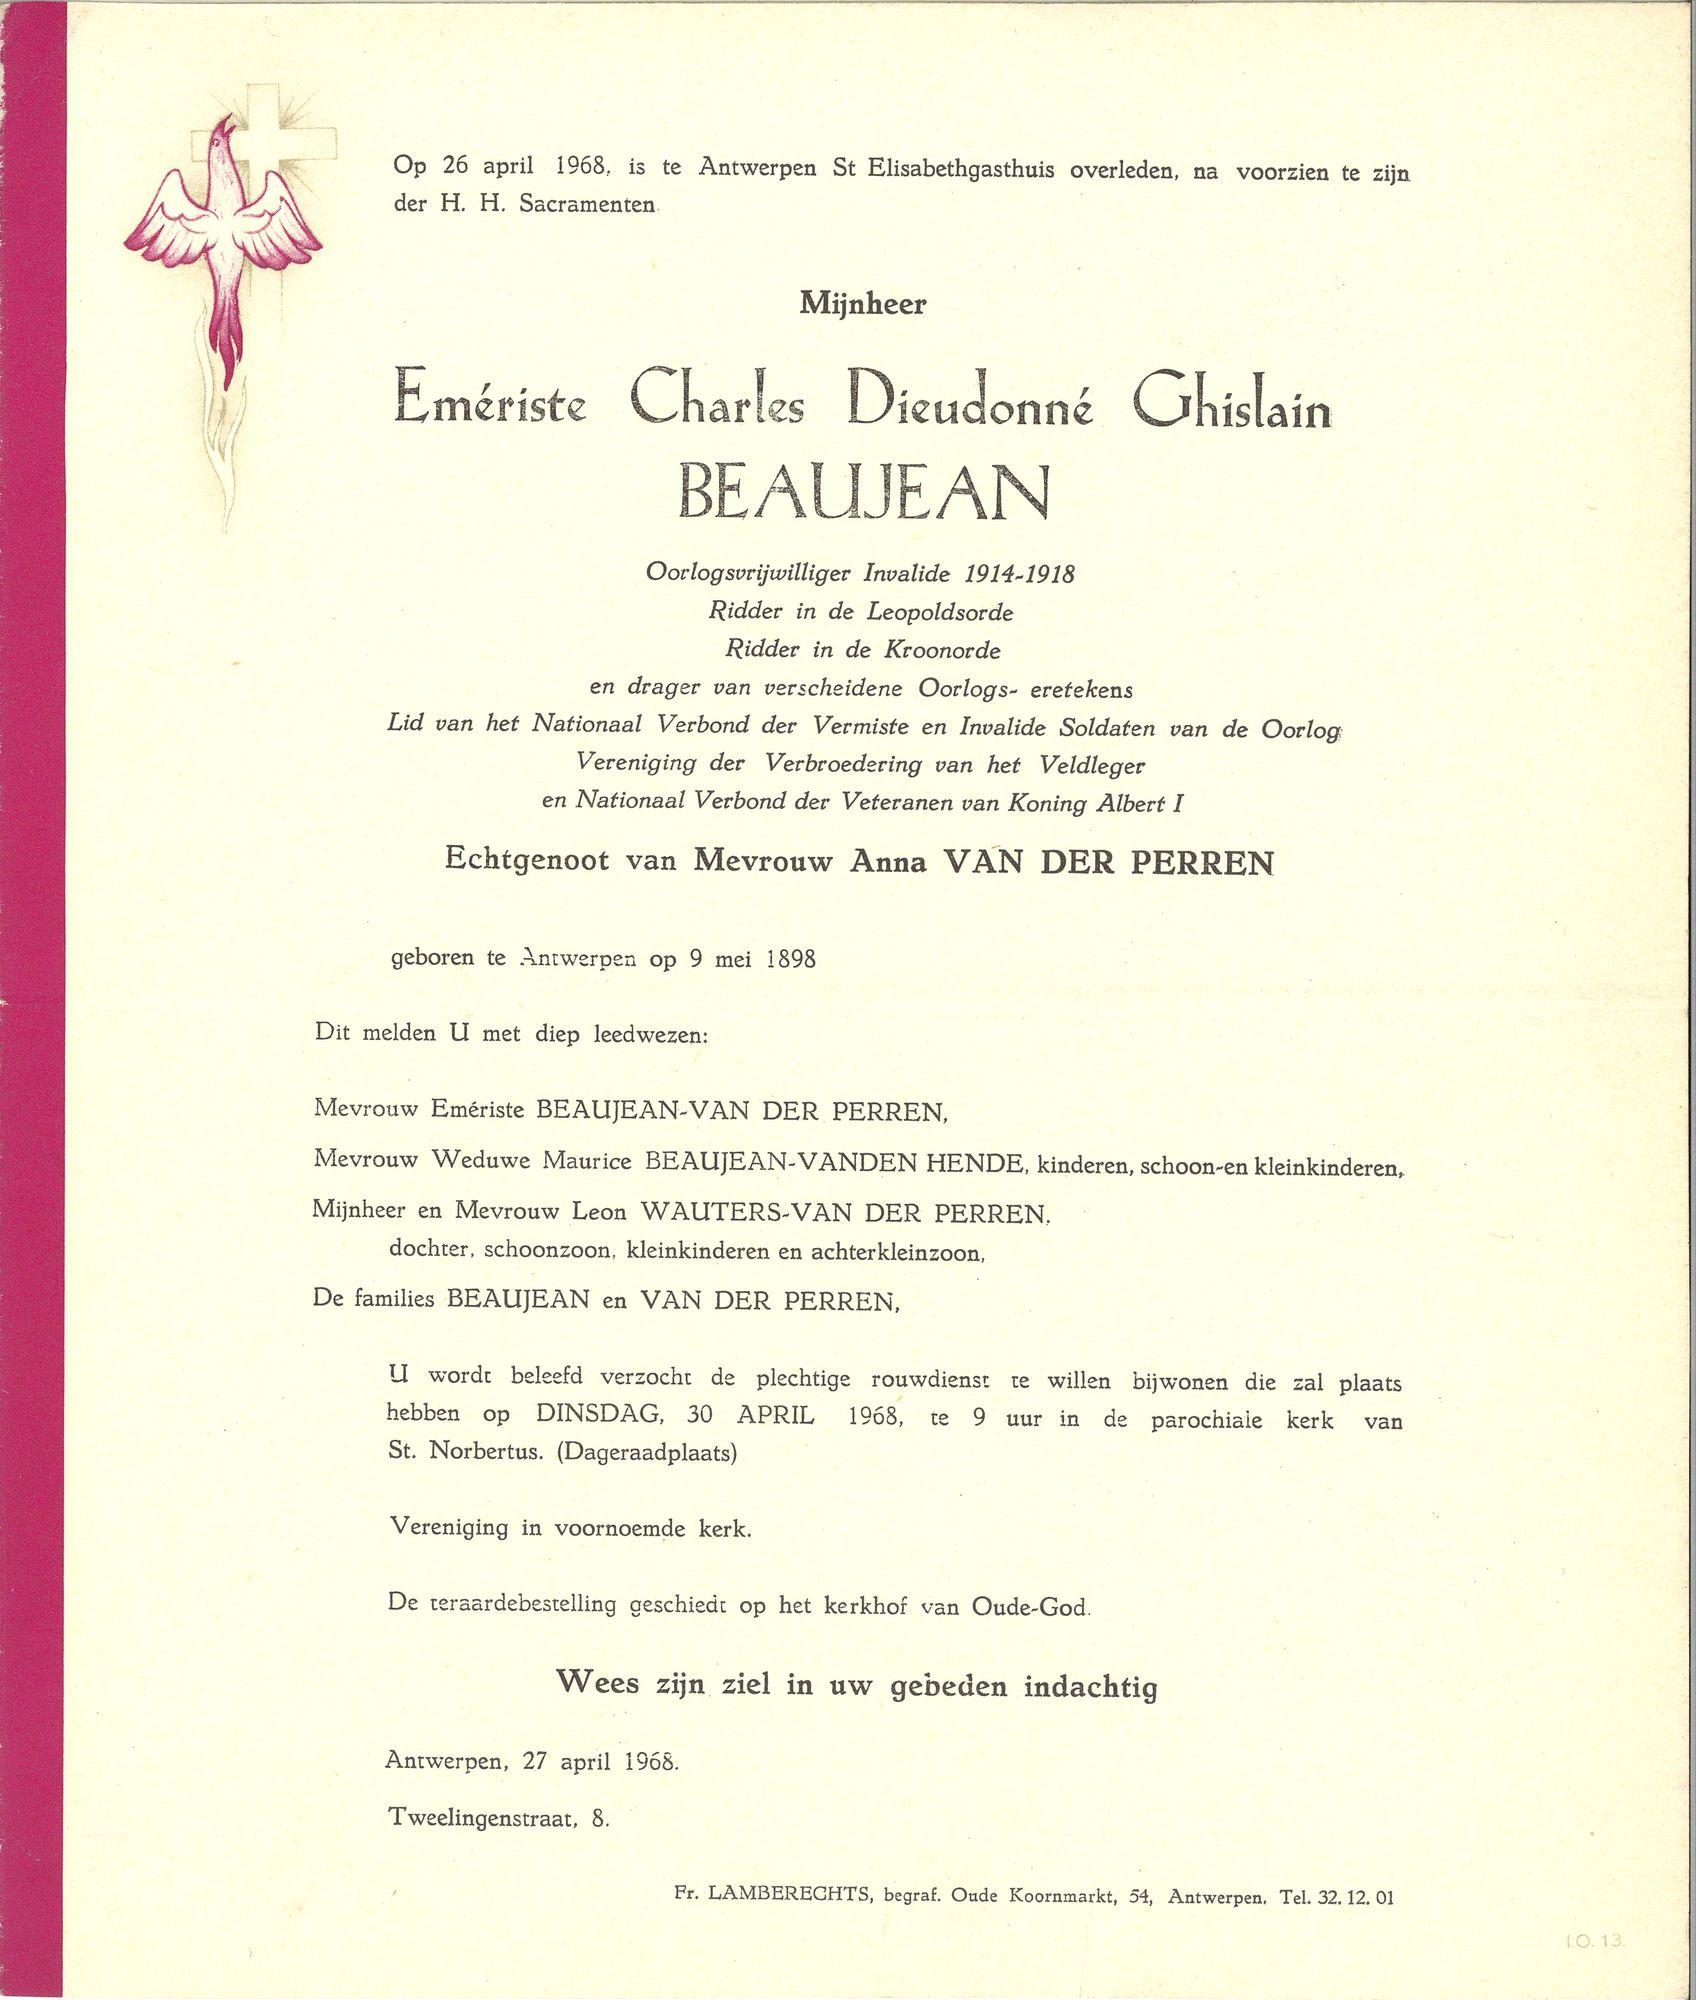 Emériste Charles Dieudonné Ghislain Beaujean